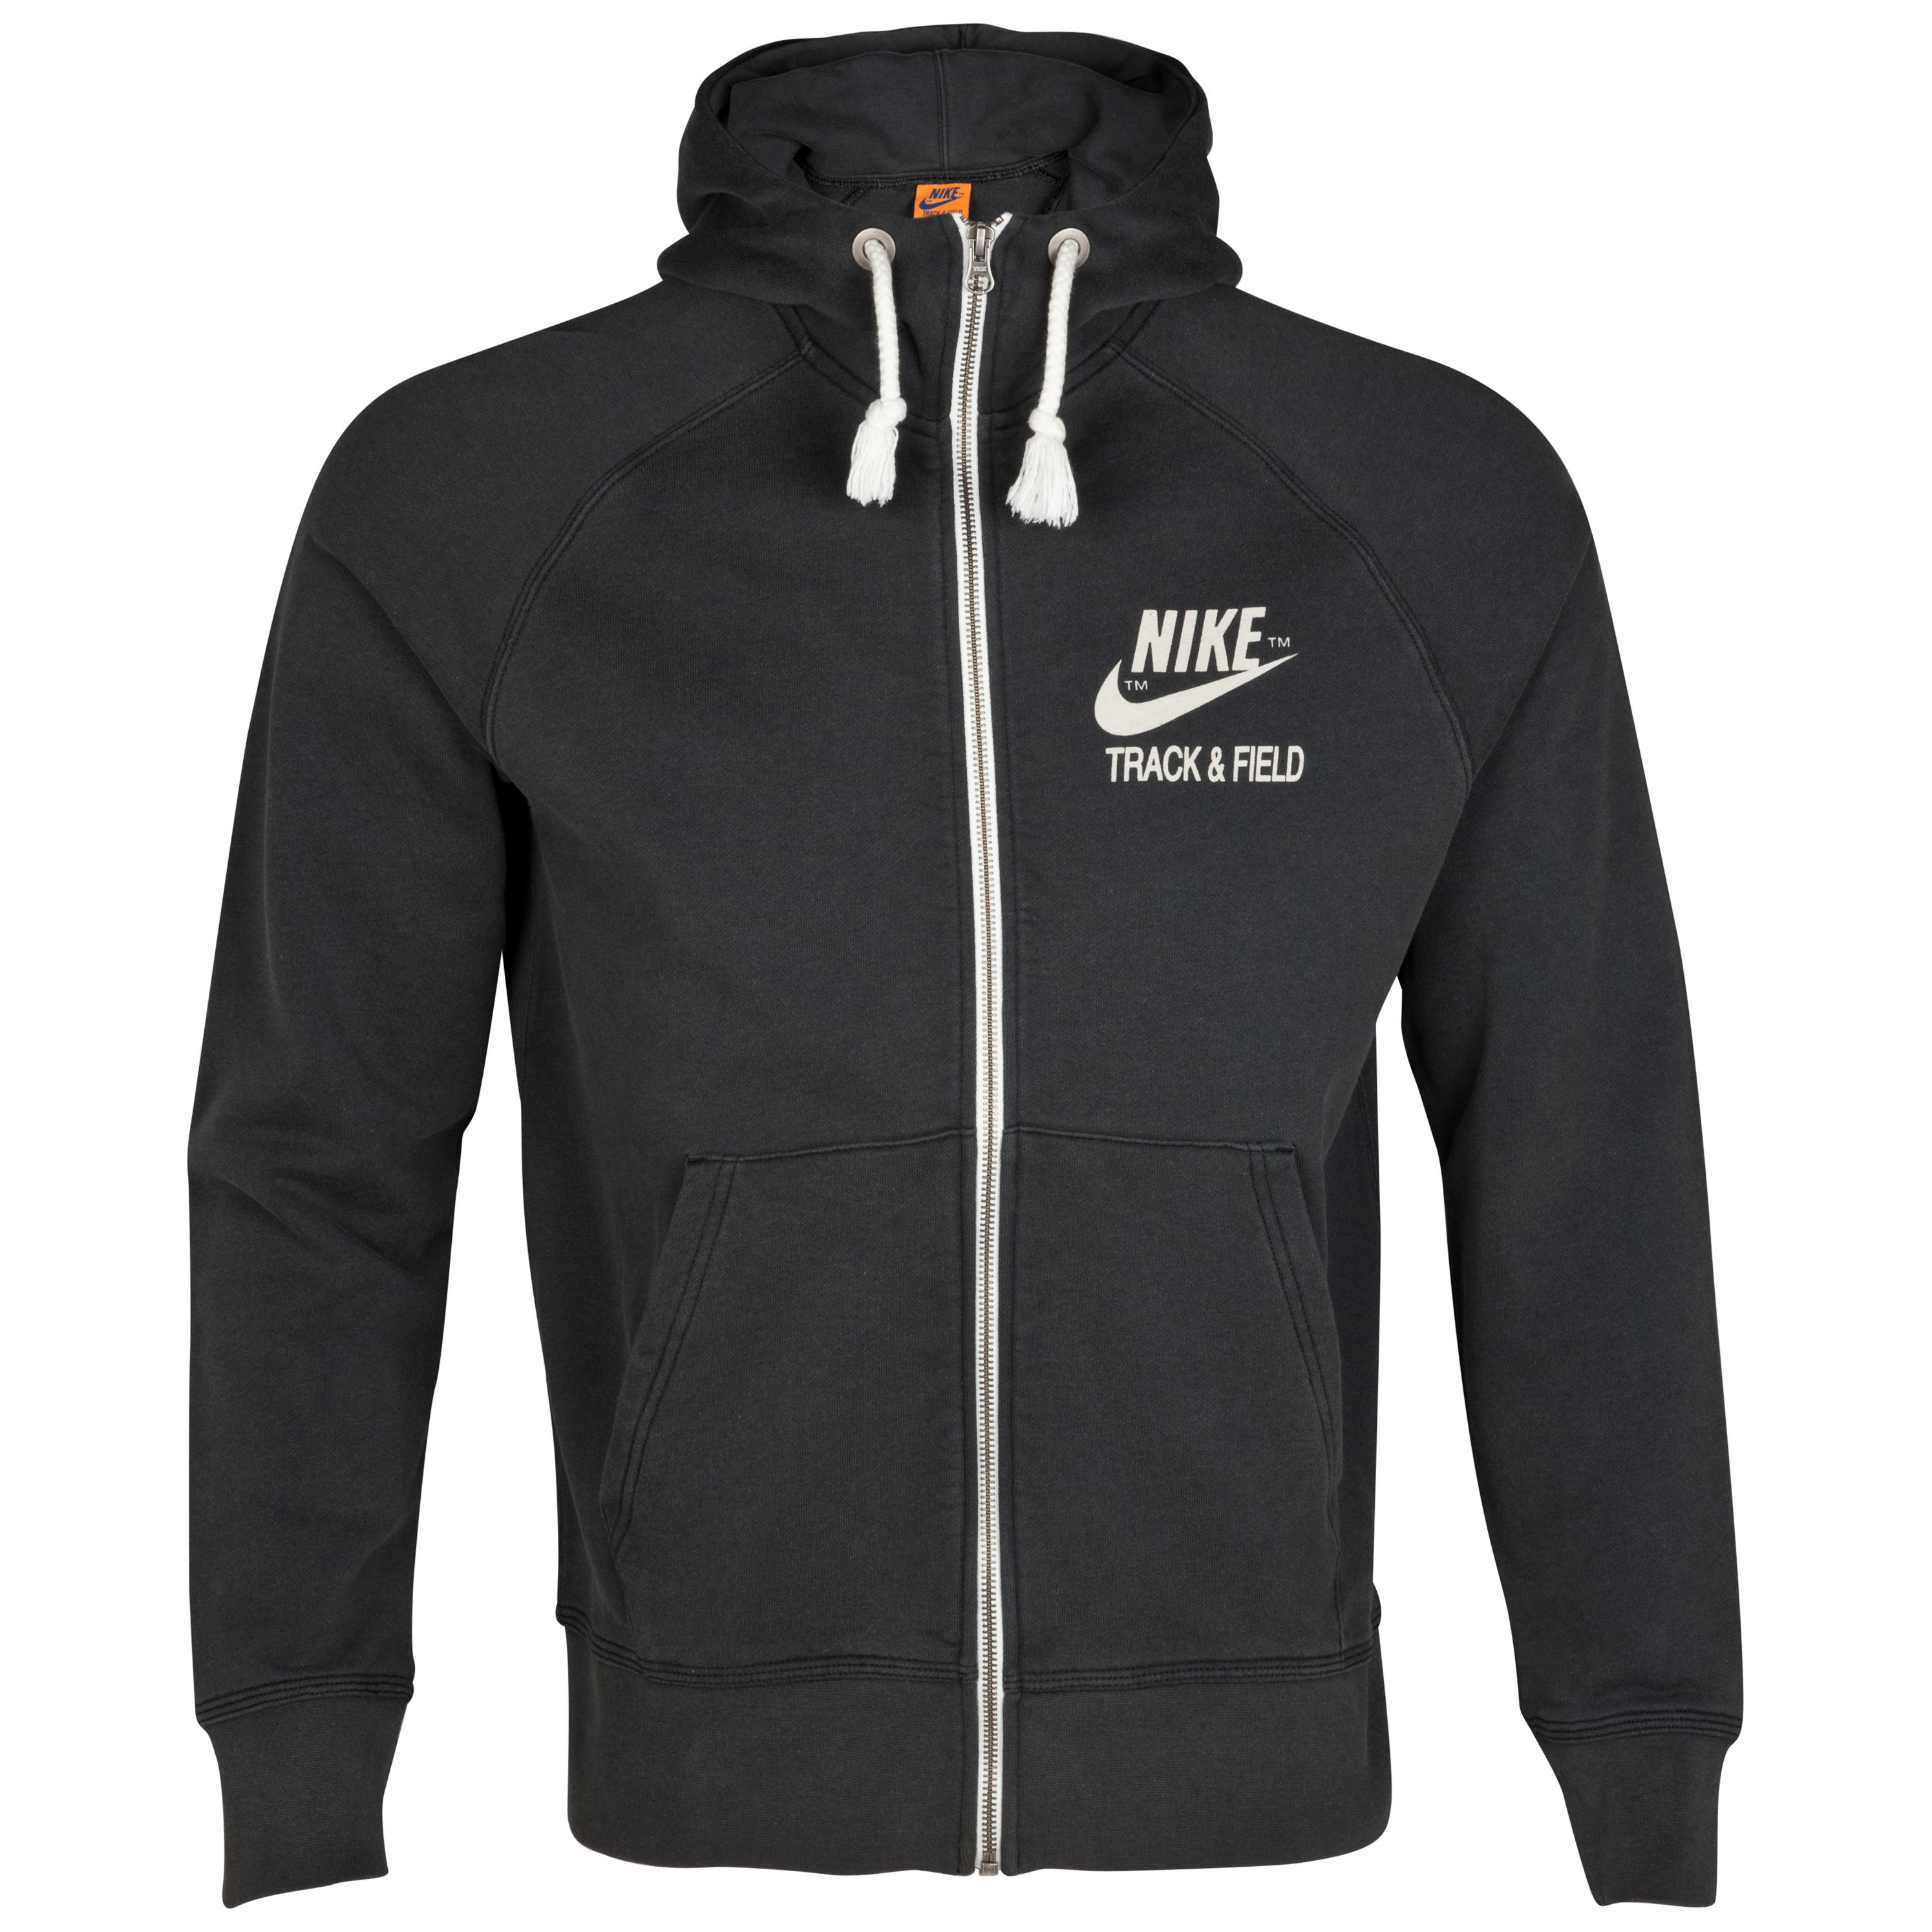 Nike NTandF Graphic AW77 Full Zip Hoody - Black/Sail